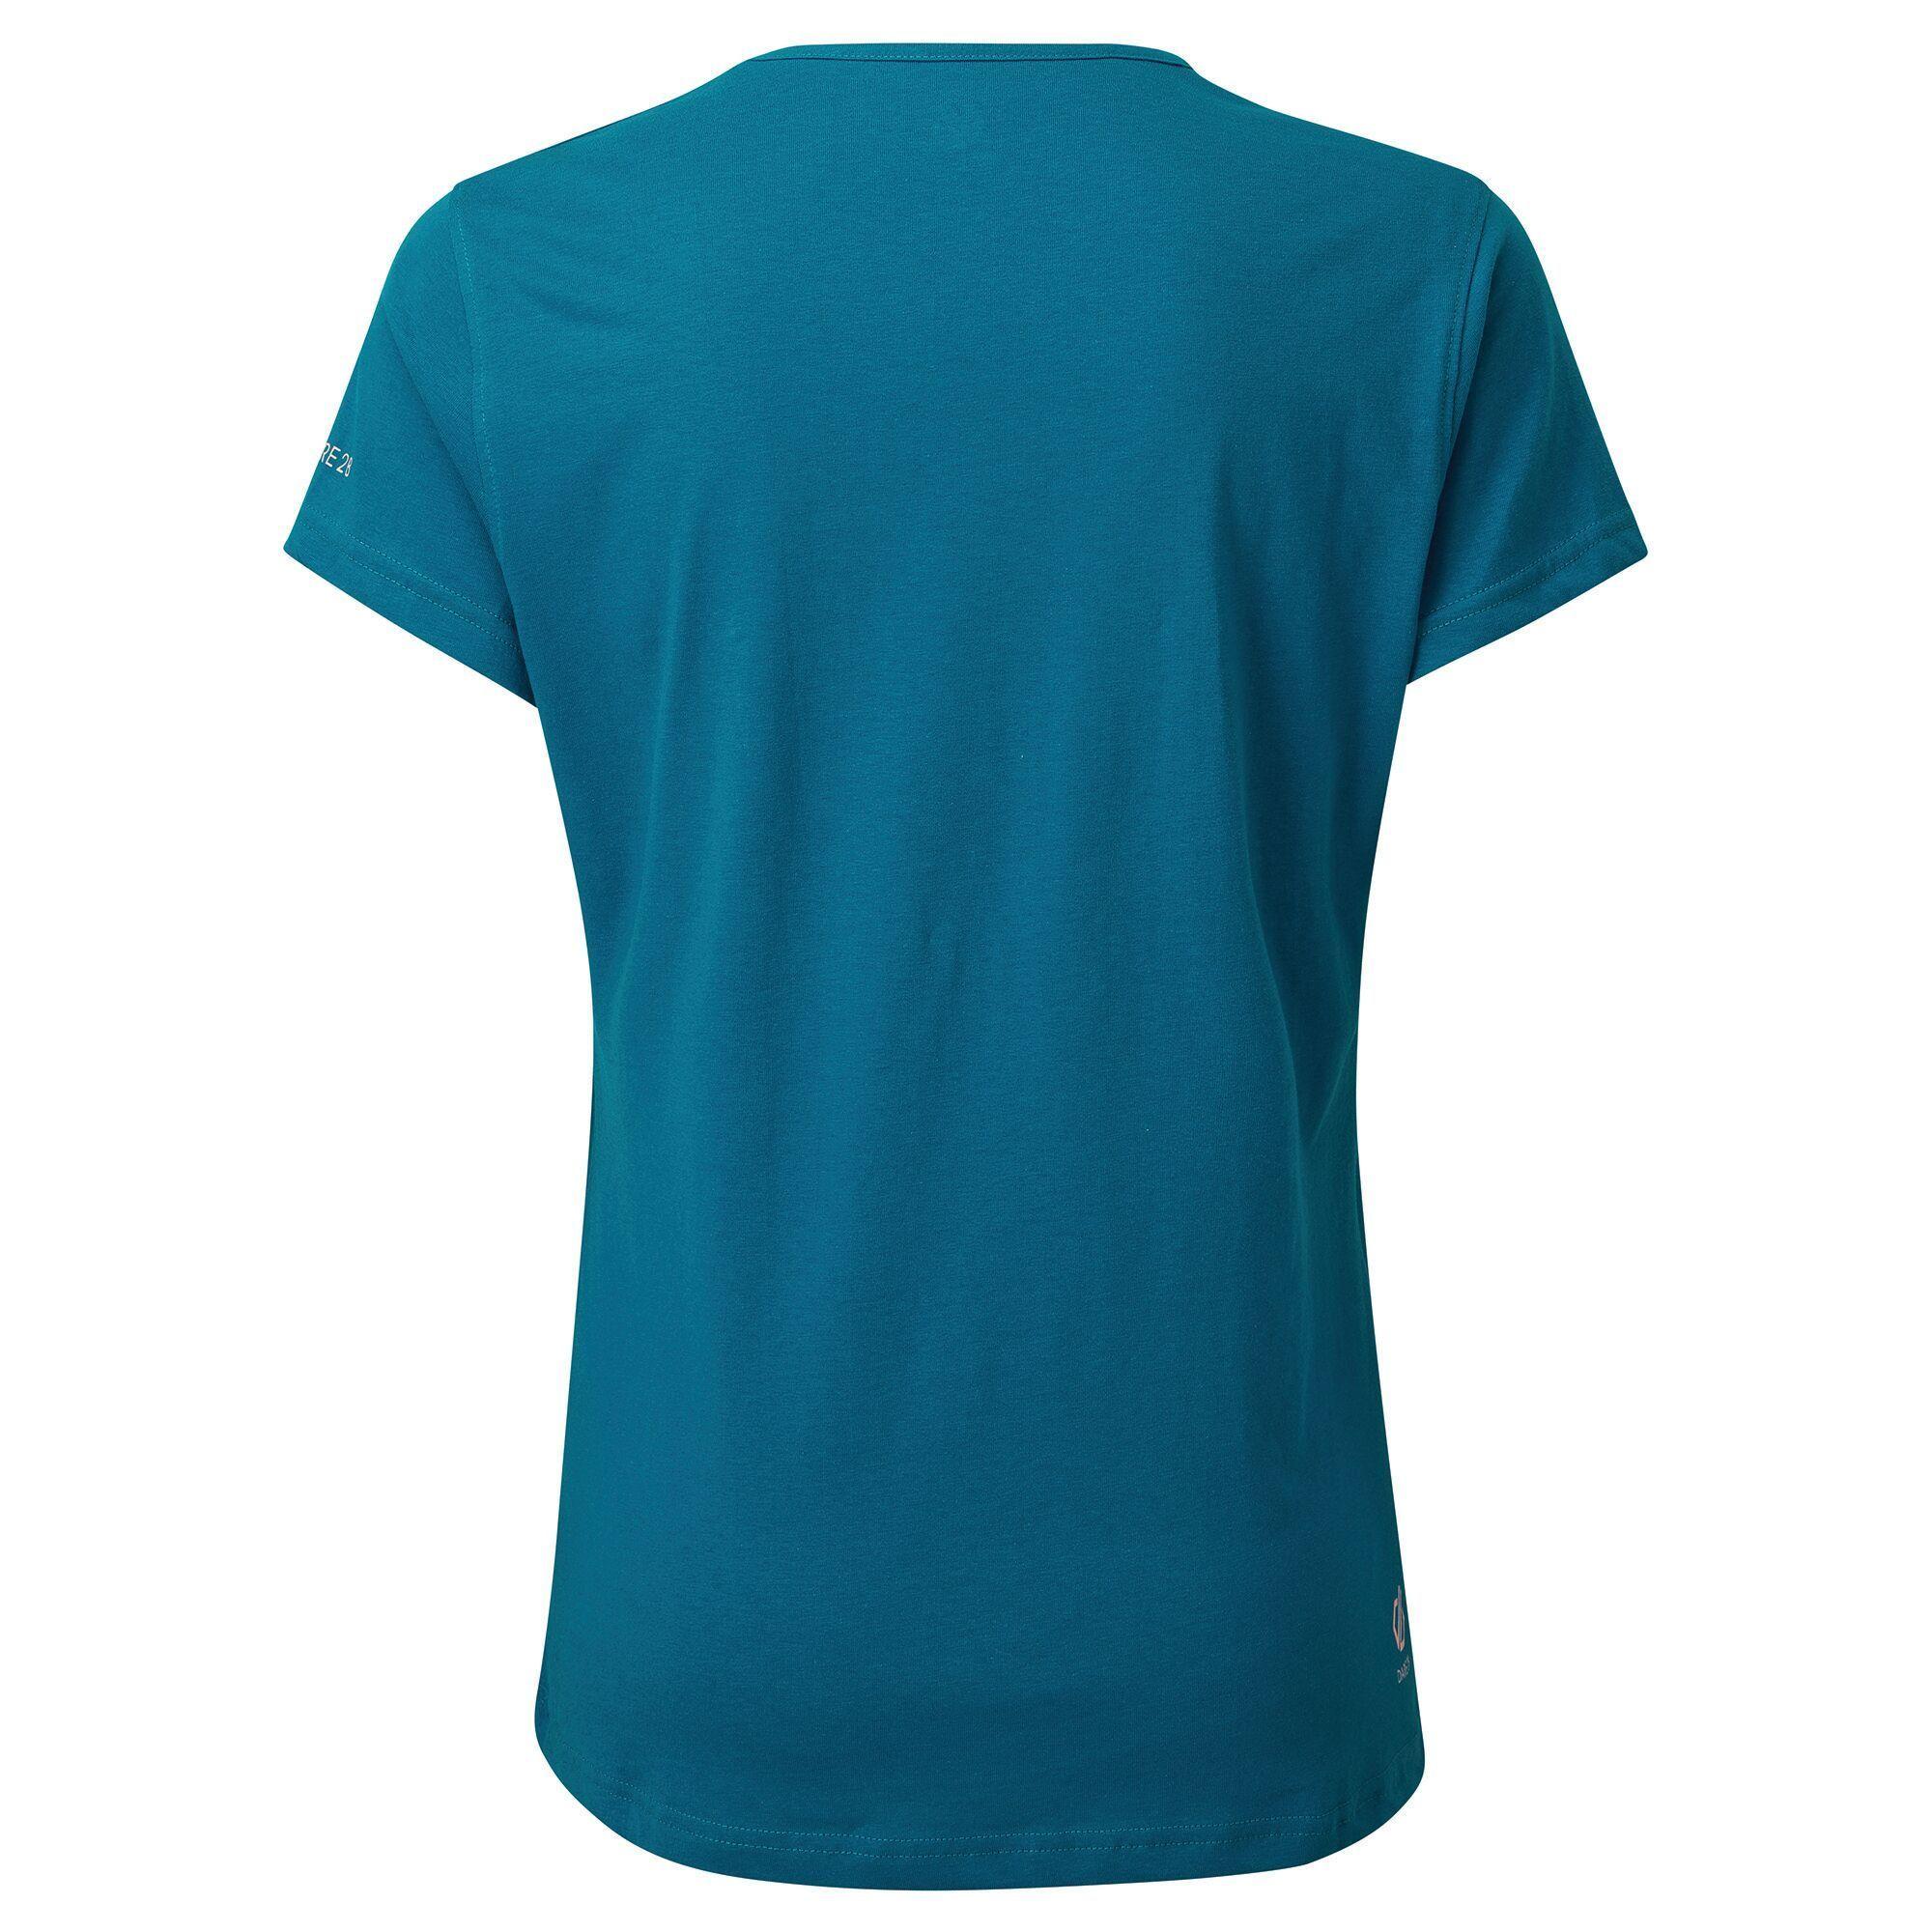 Dare 2B Womens/Ladies Parallel Dreamcatcher Print T-Shirt